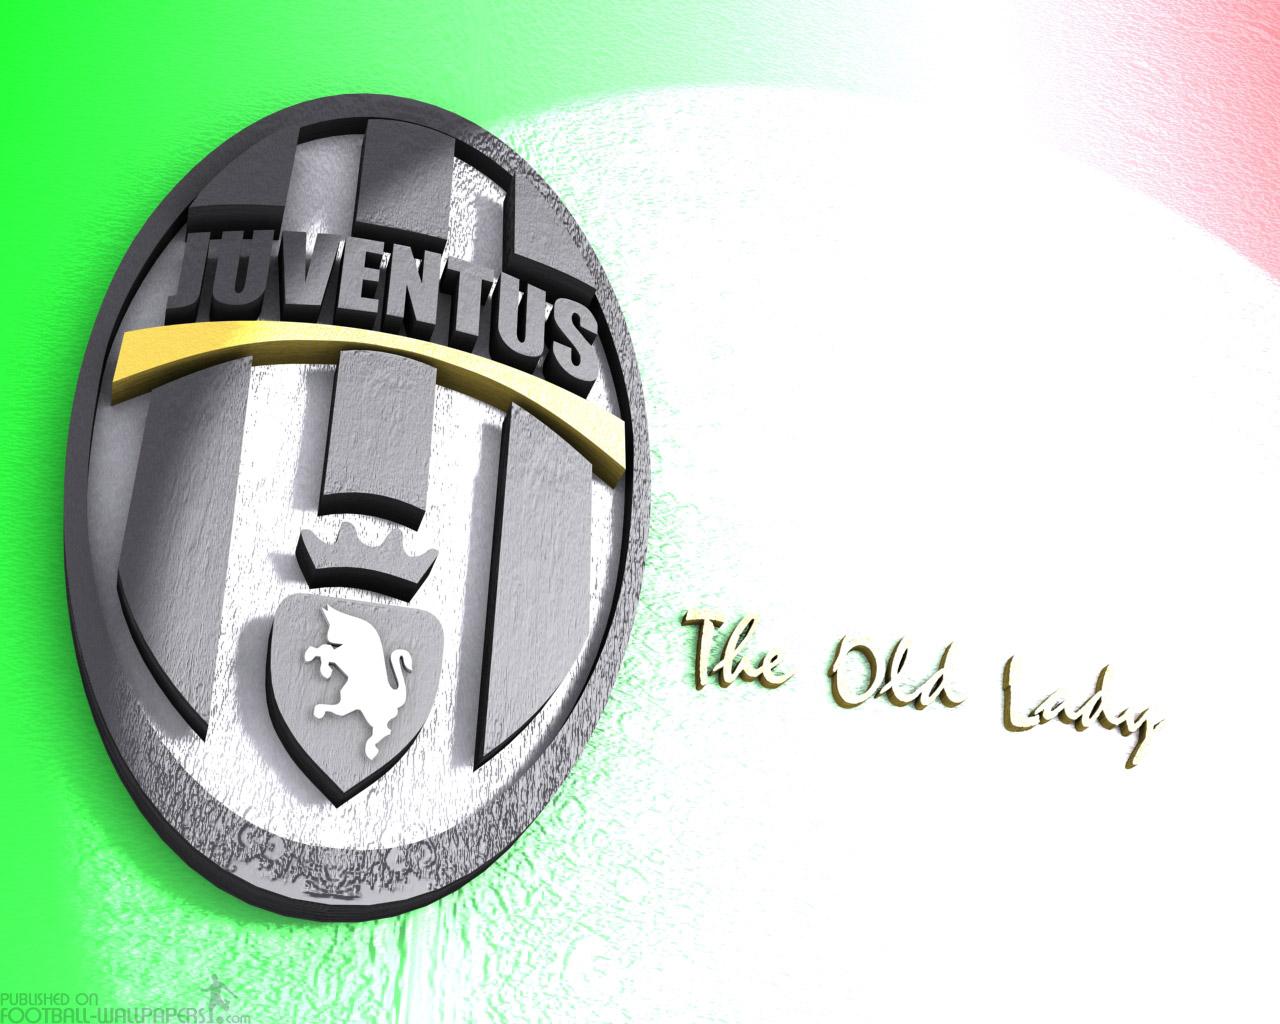 http://1.bp.blogspot.com/-UmOos_mv1ek/ThhZ1U3DWzI/AAAAAAAAA1g/b43dJVTK1oM/s1600/Juventus+Wallpaper+2011+4.jpg